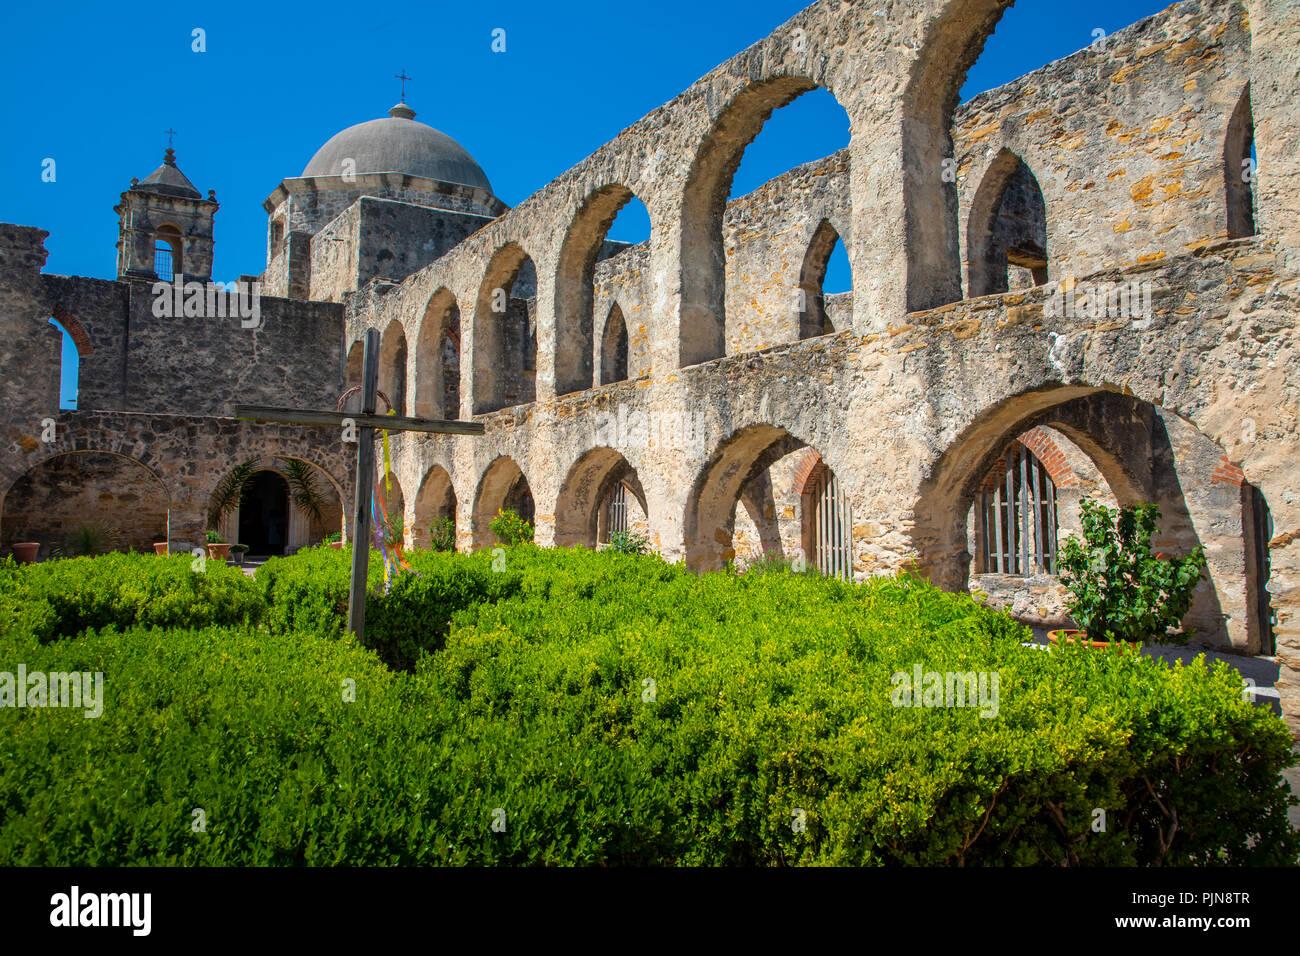 Mission San José y San Miguel de Aguayo is a historic Catholic mission in San Antonio, Texas, USA. - Stock Image